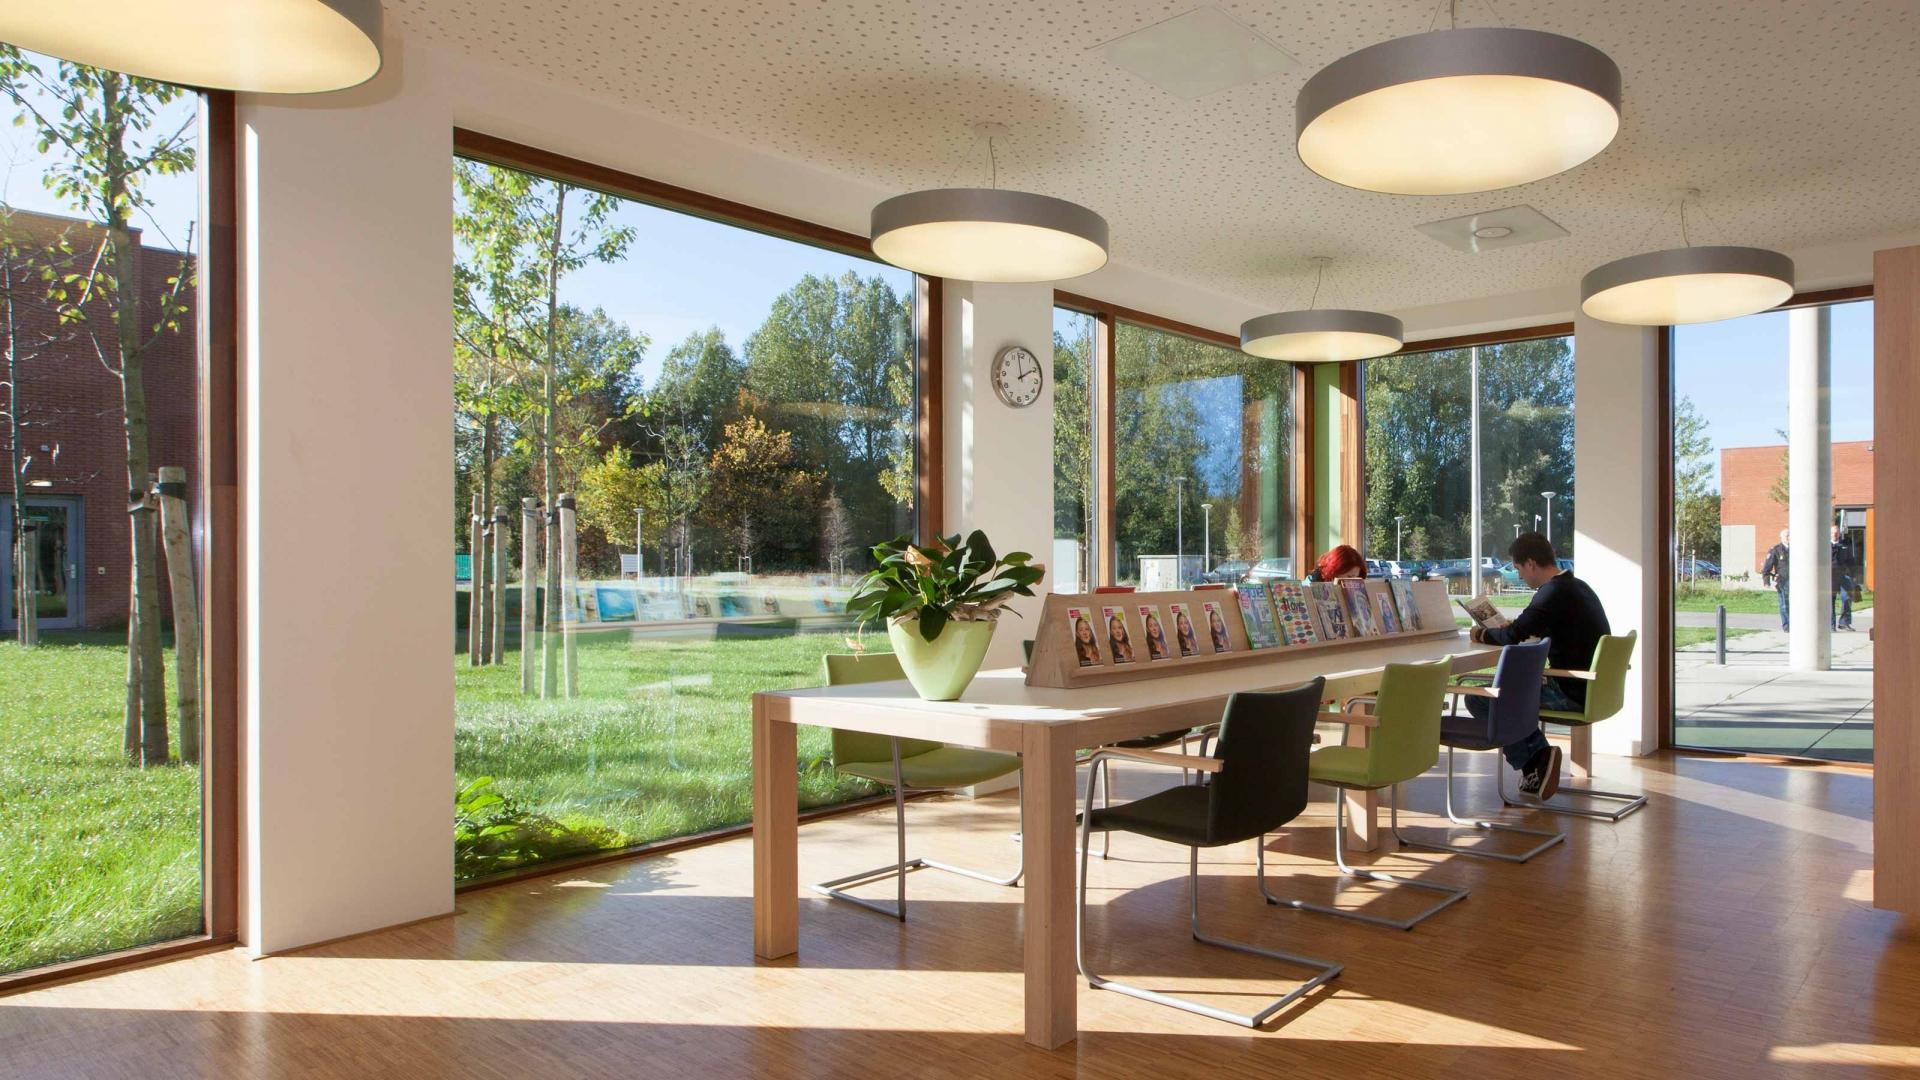 Interiors hotel leisure egm architects for Design hotel juist